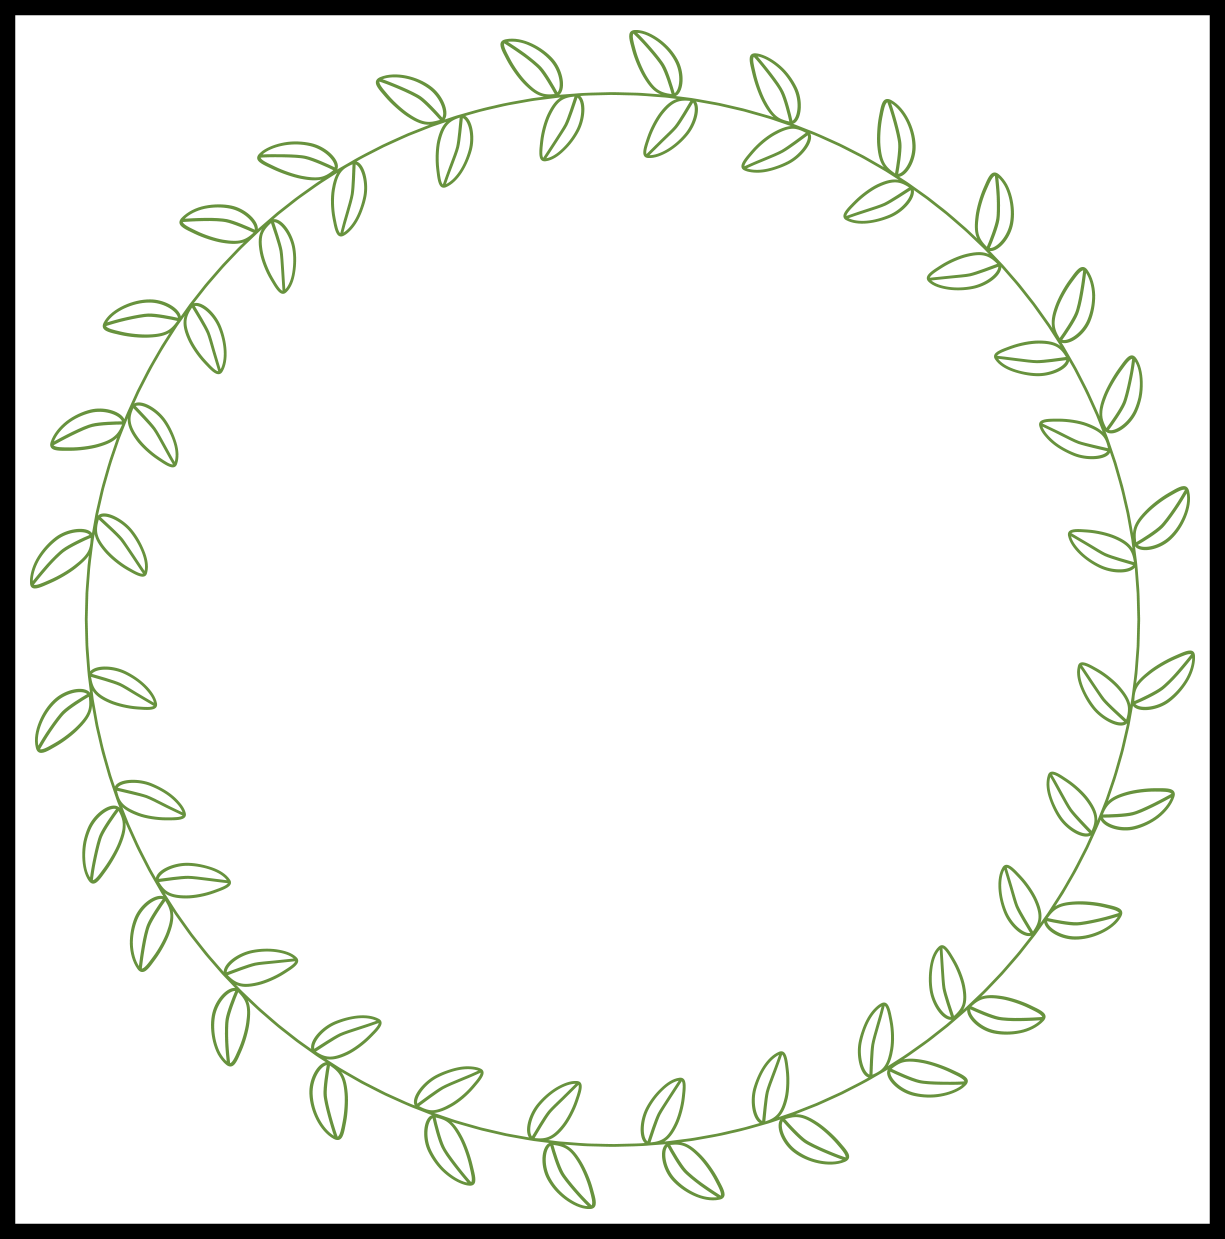 Amazing Circle Leaf Border Chalkboard Inspiration For Sunflower